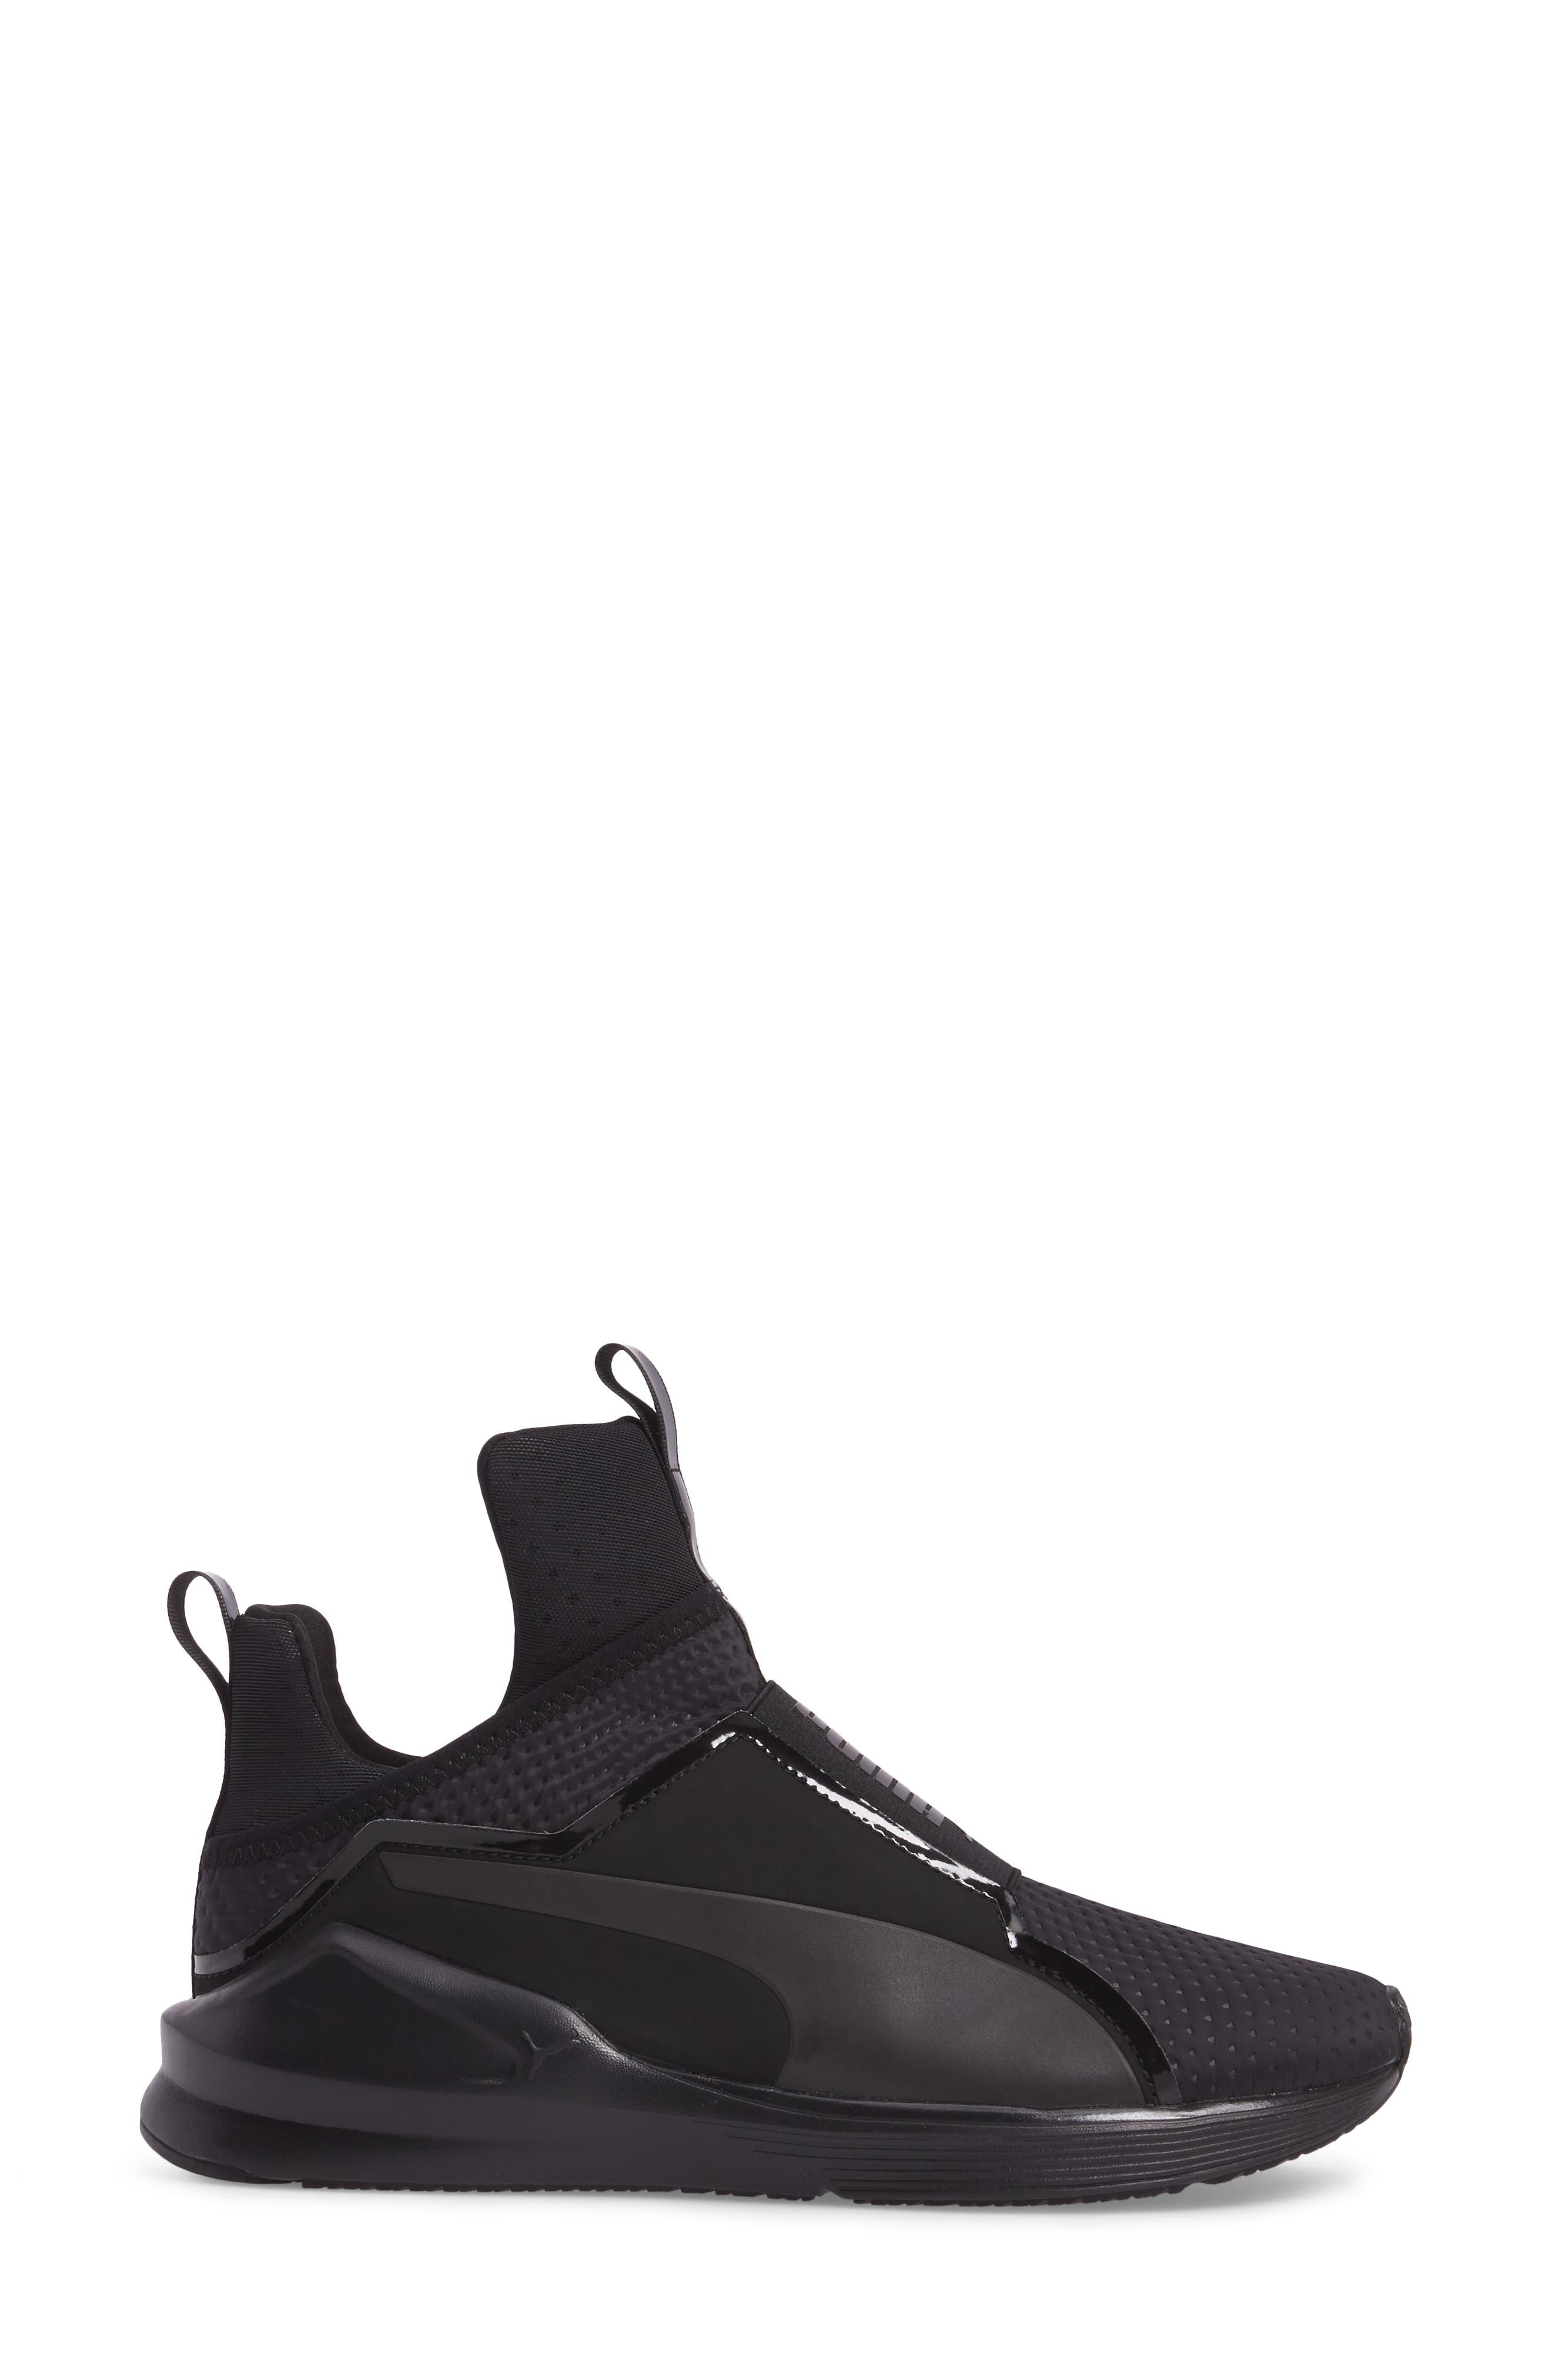 Alternate Image 3  - PUMA 'Fierce Core' High Top Sneaker (Women)